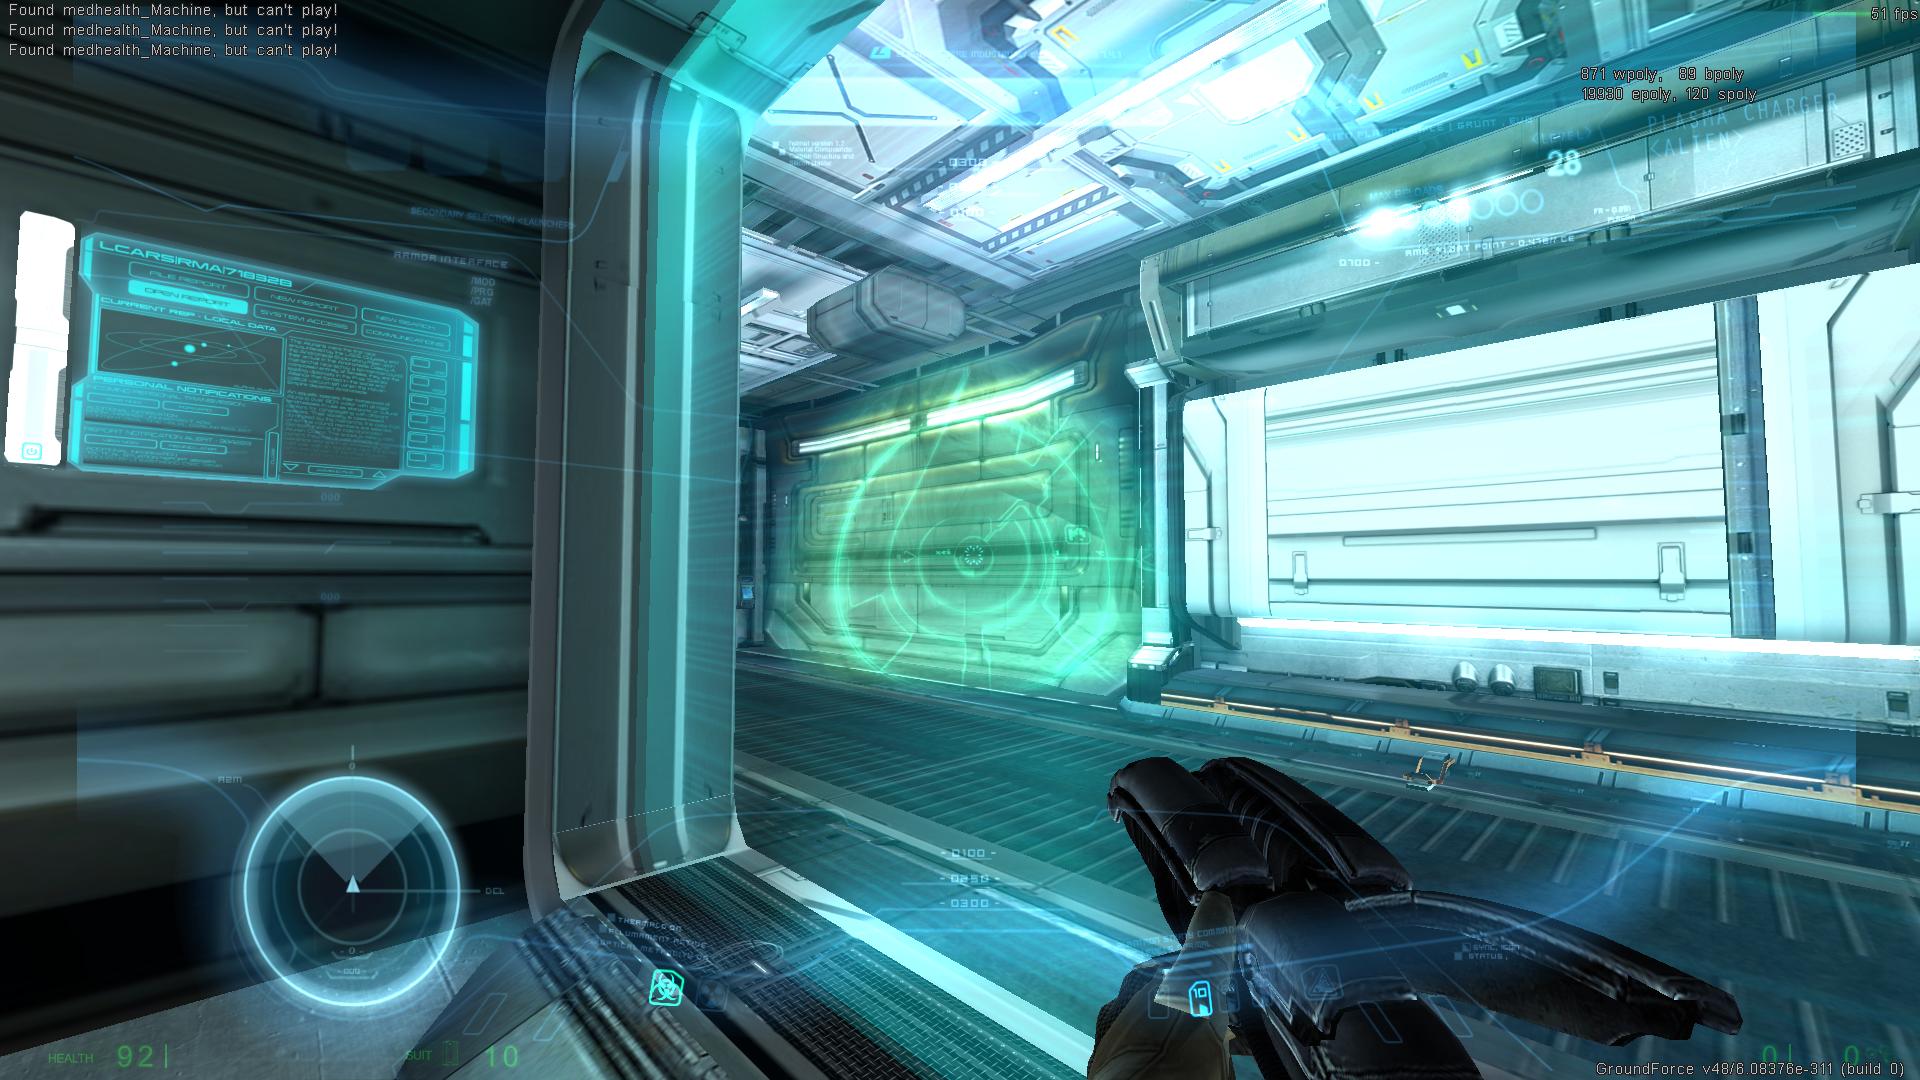 ew_teleportation_docking_0036